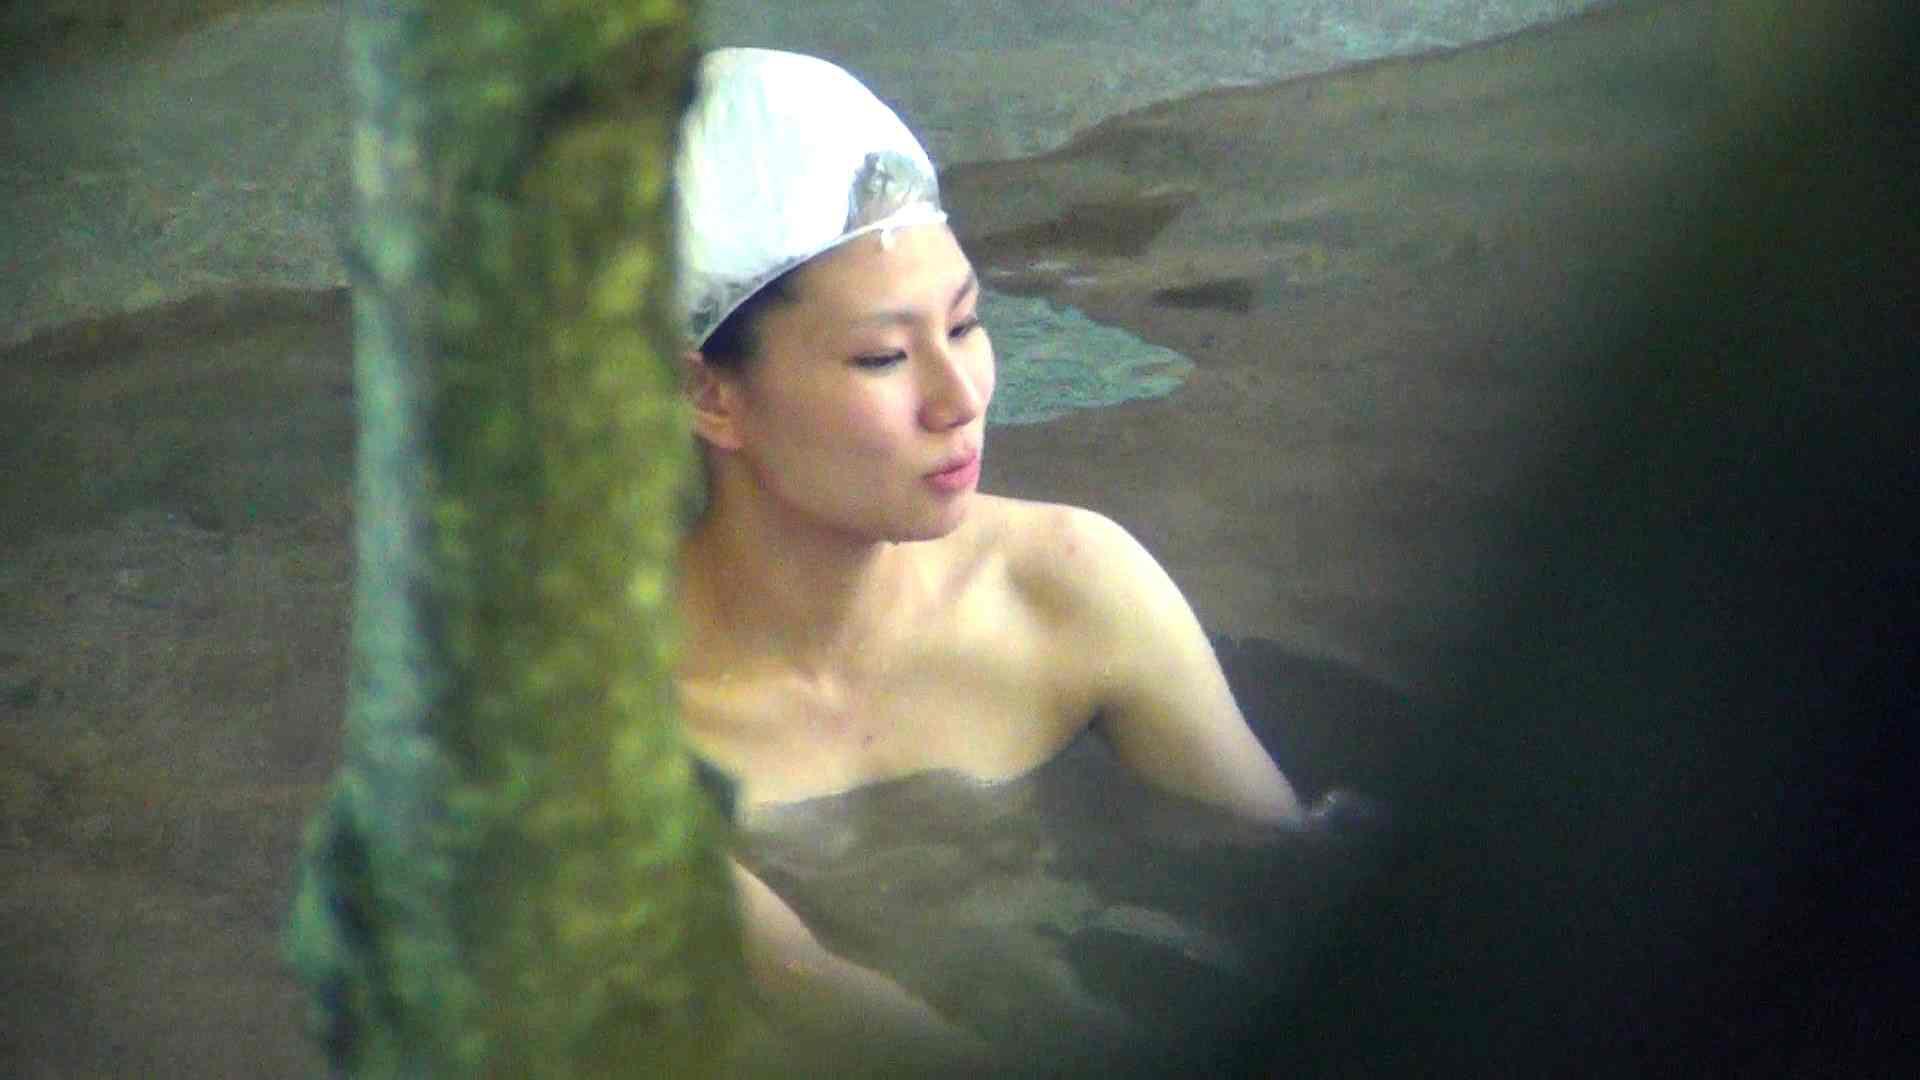 Vol.43 ヘアキャップをしても美しい中性的美女simai 露天丸見え AV無料動画キャプチャ 110画像 41